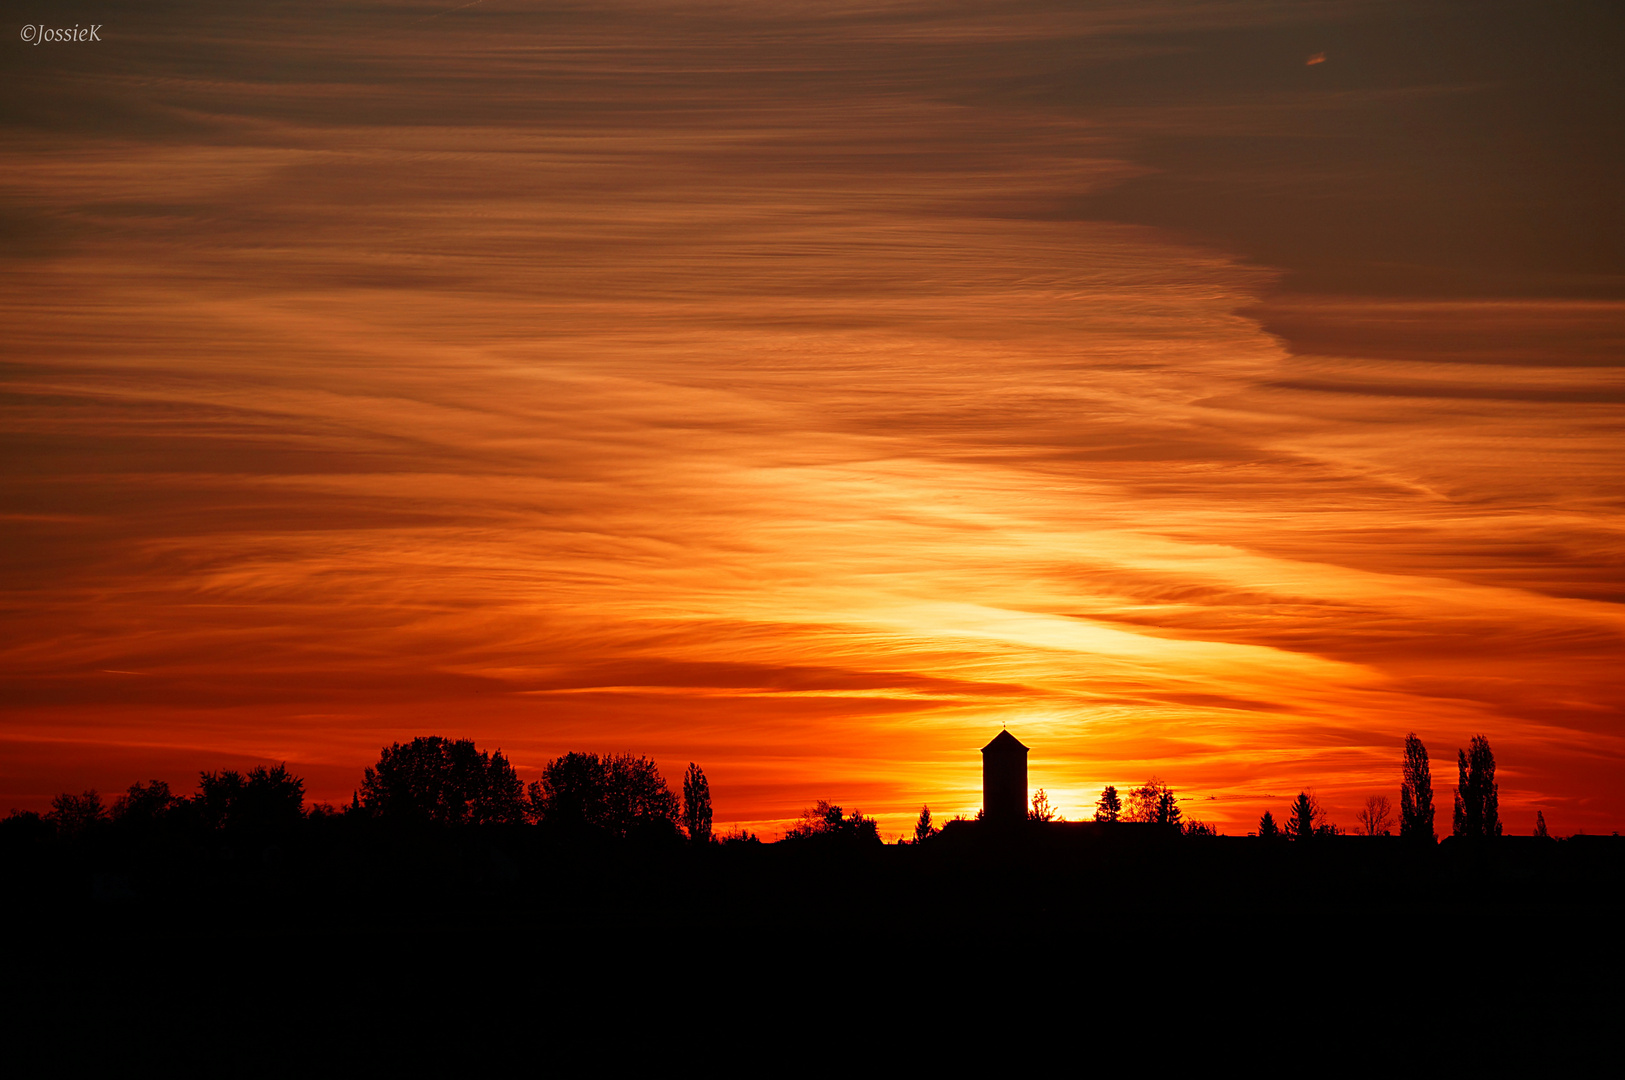 Wasserturm beim Sonnenaufgang